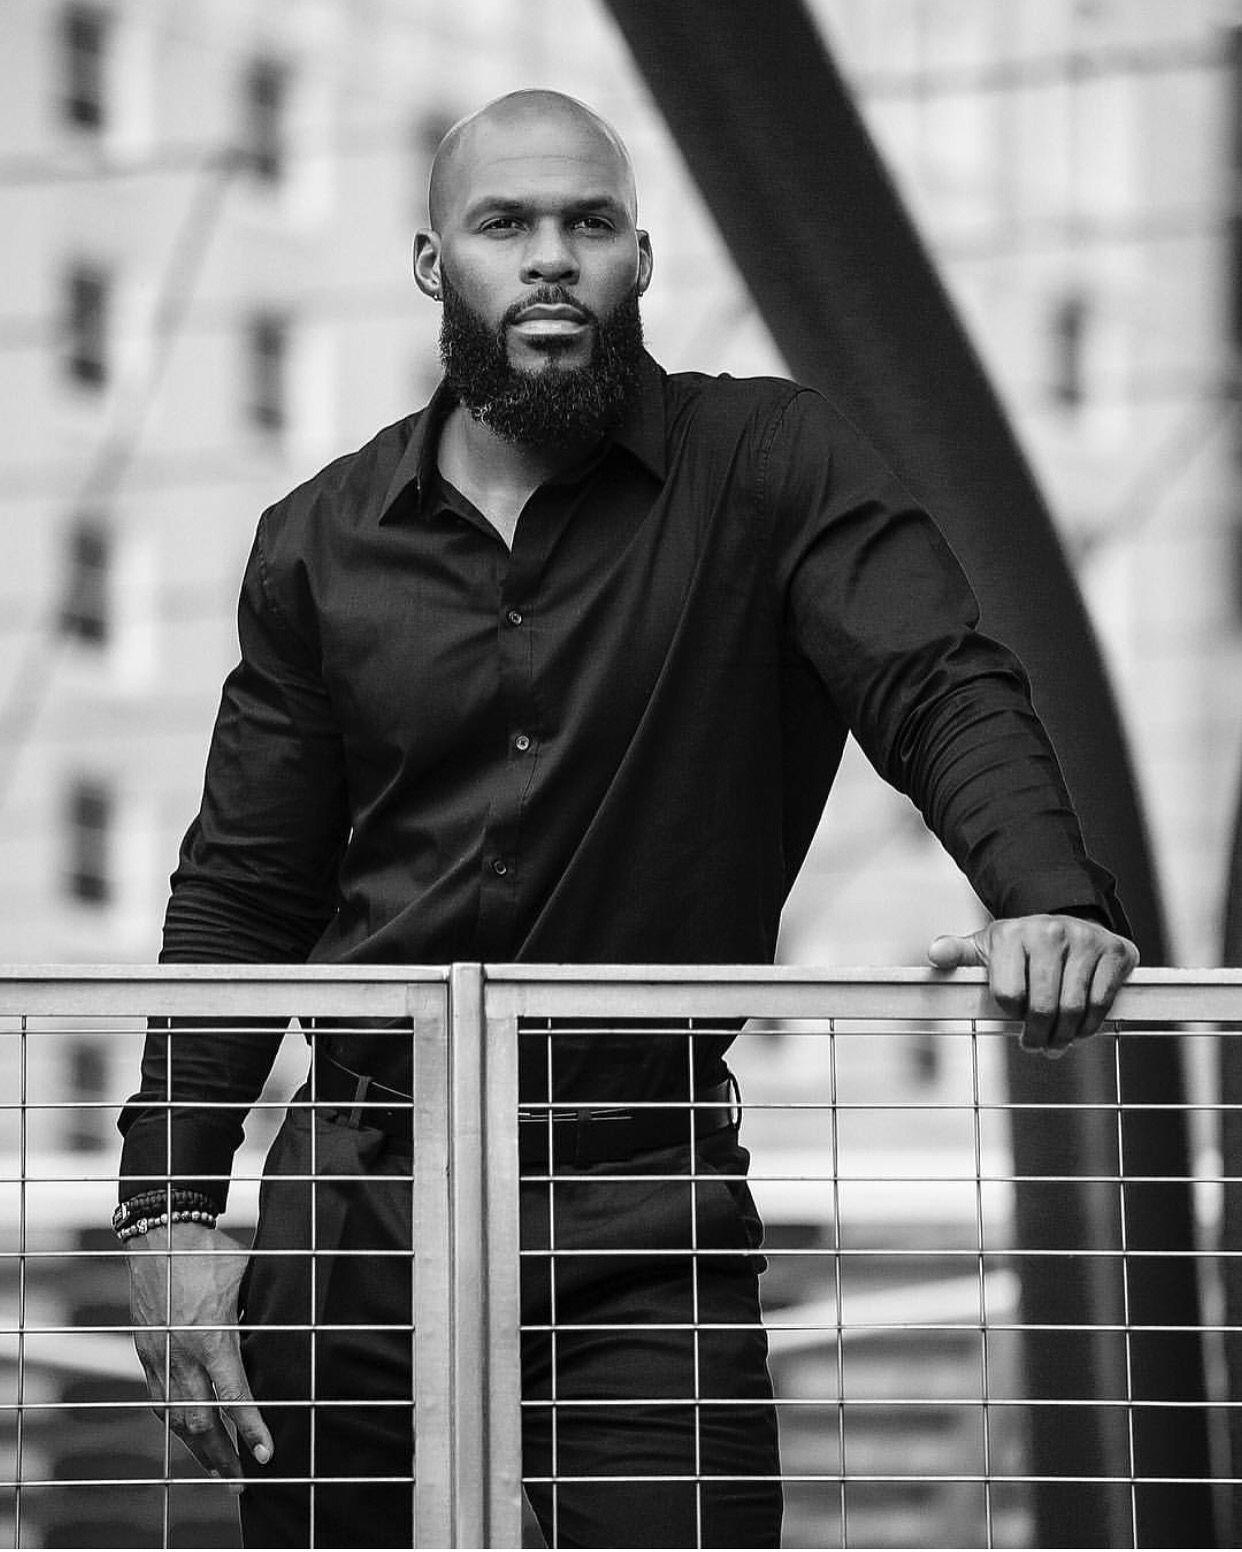 Pin On Black Men With Beards